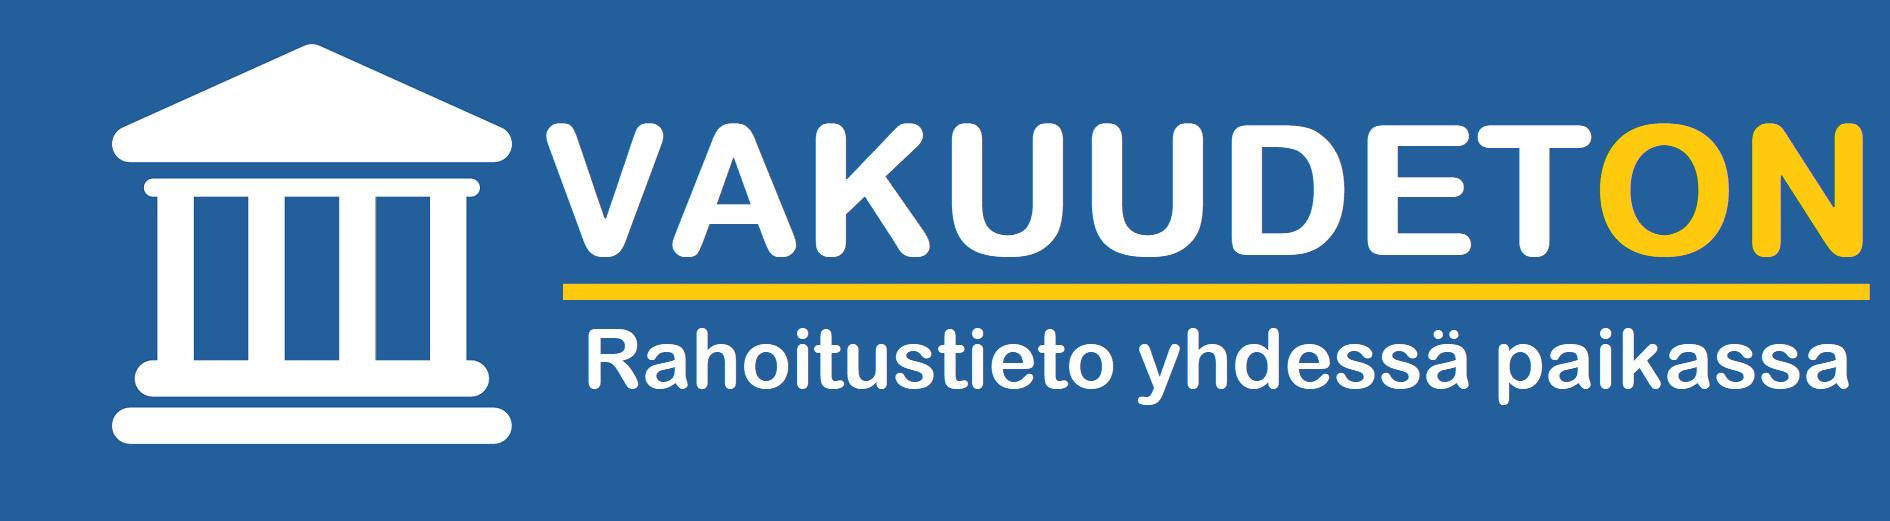 Vakuudeton.com